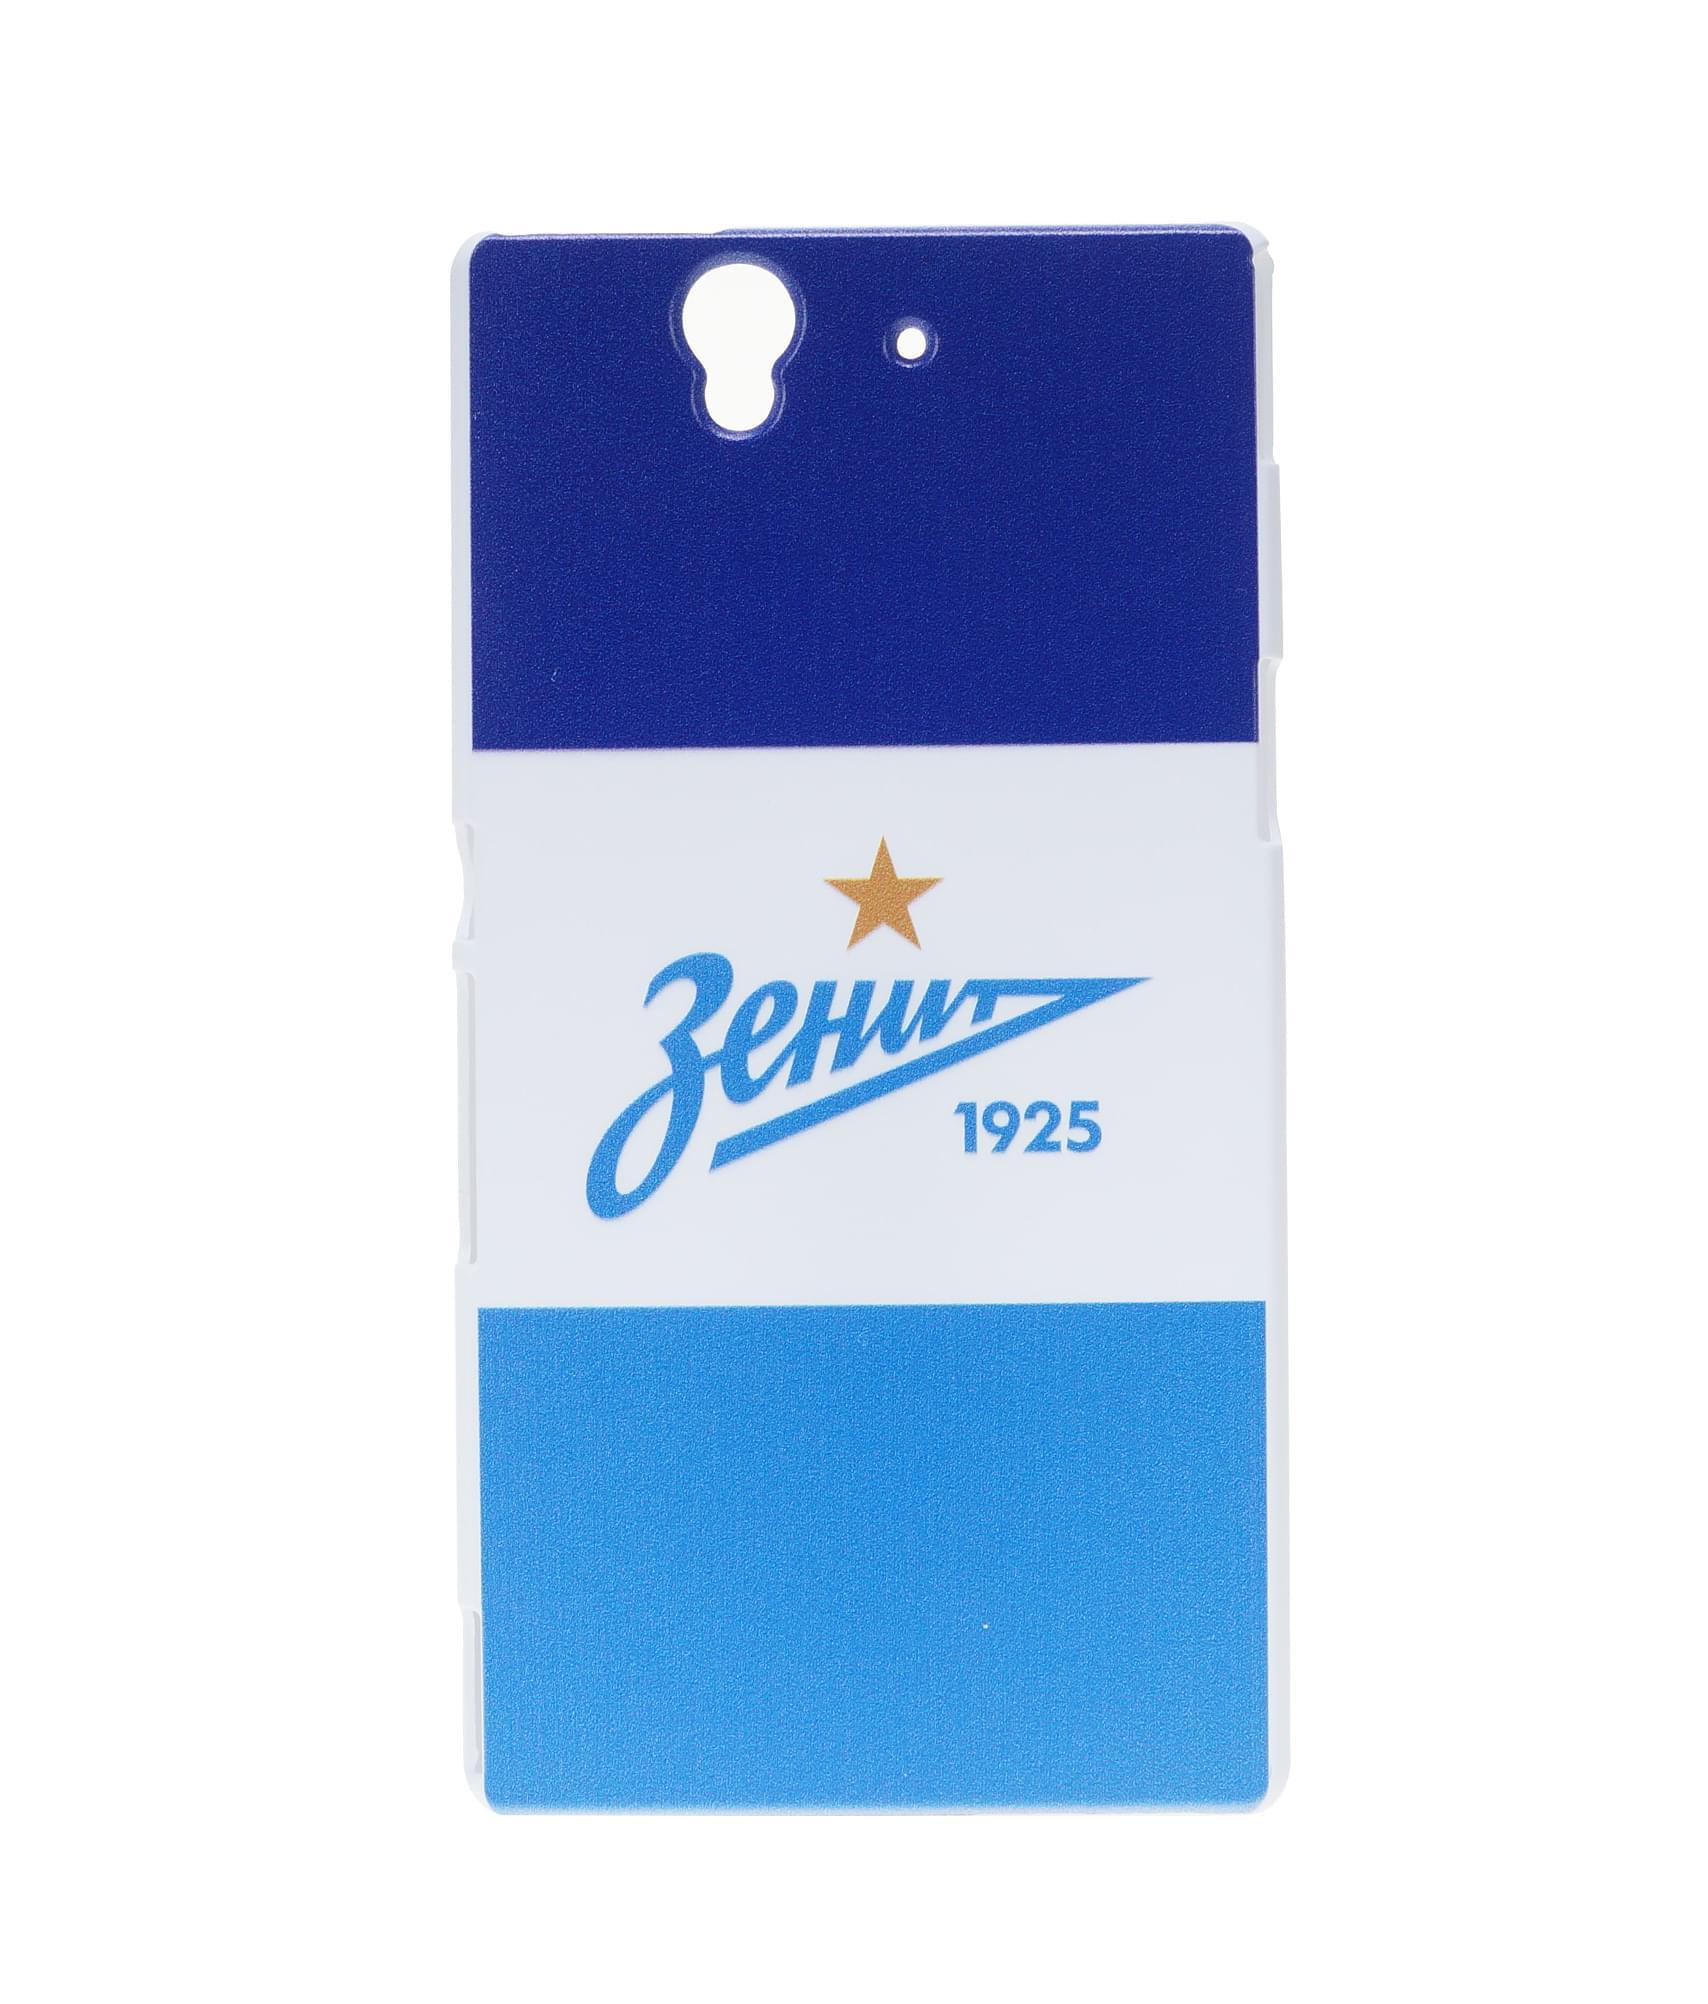 Чехол для Sony Xperia Z «Триколор» Зенит sony xperia j черный и забрать в золотом вавилоне